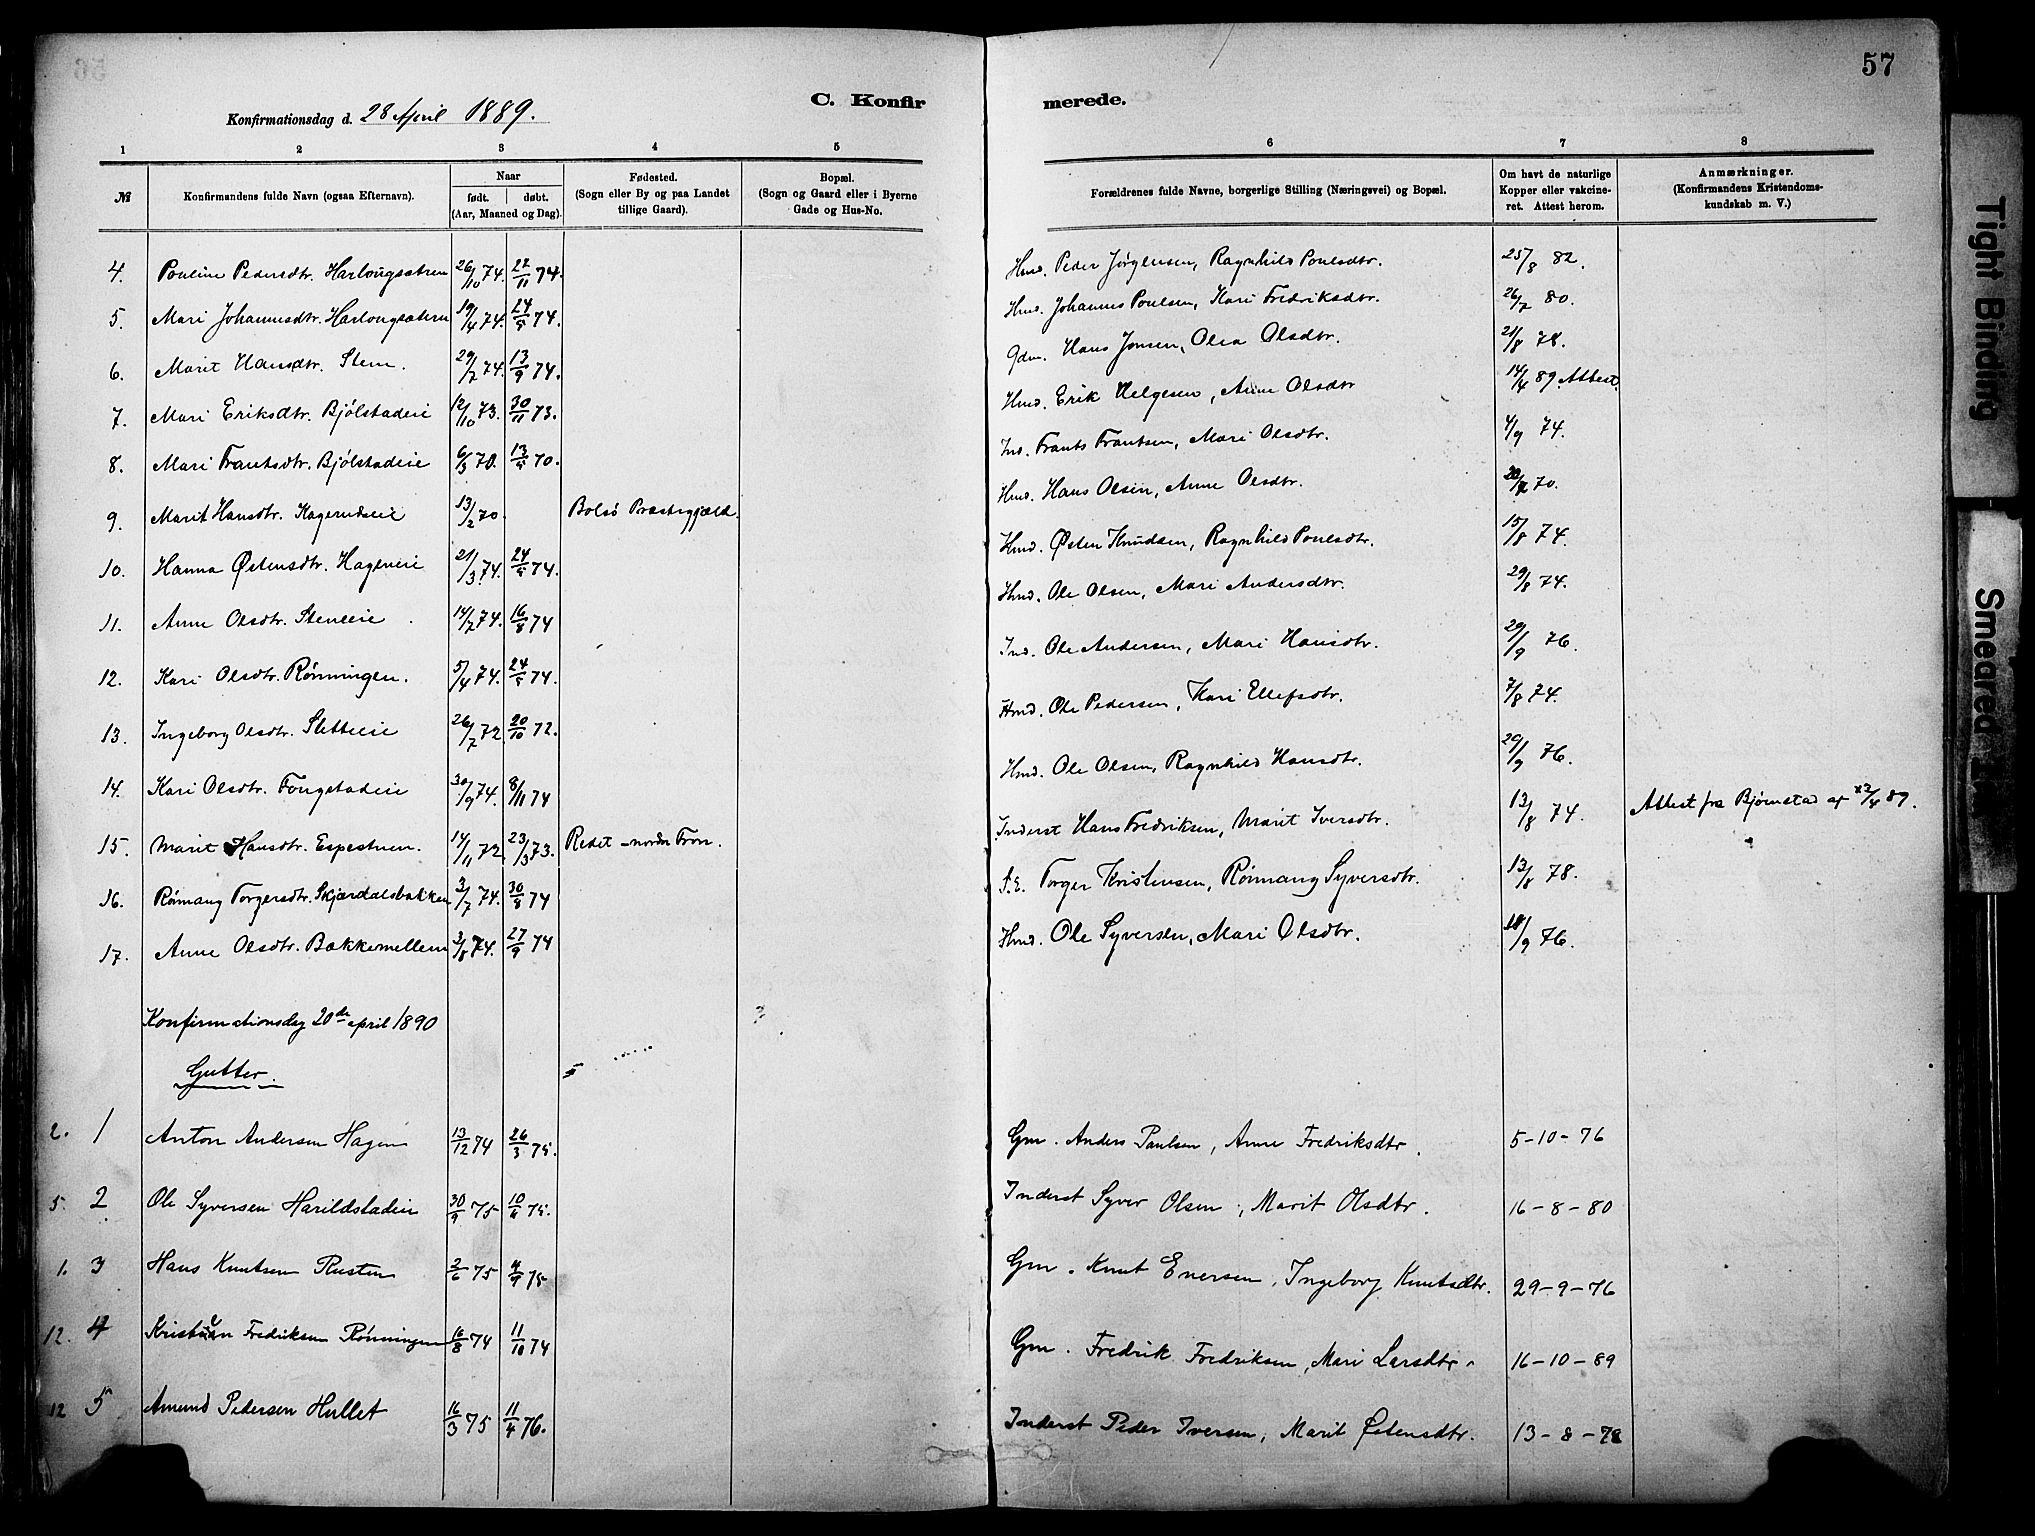 SAH, Vågå prestekontor, Ministerialbok nr. 10, 1887-1904, s. 57